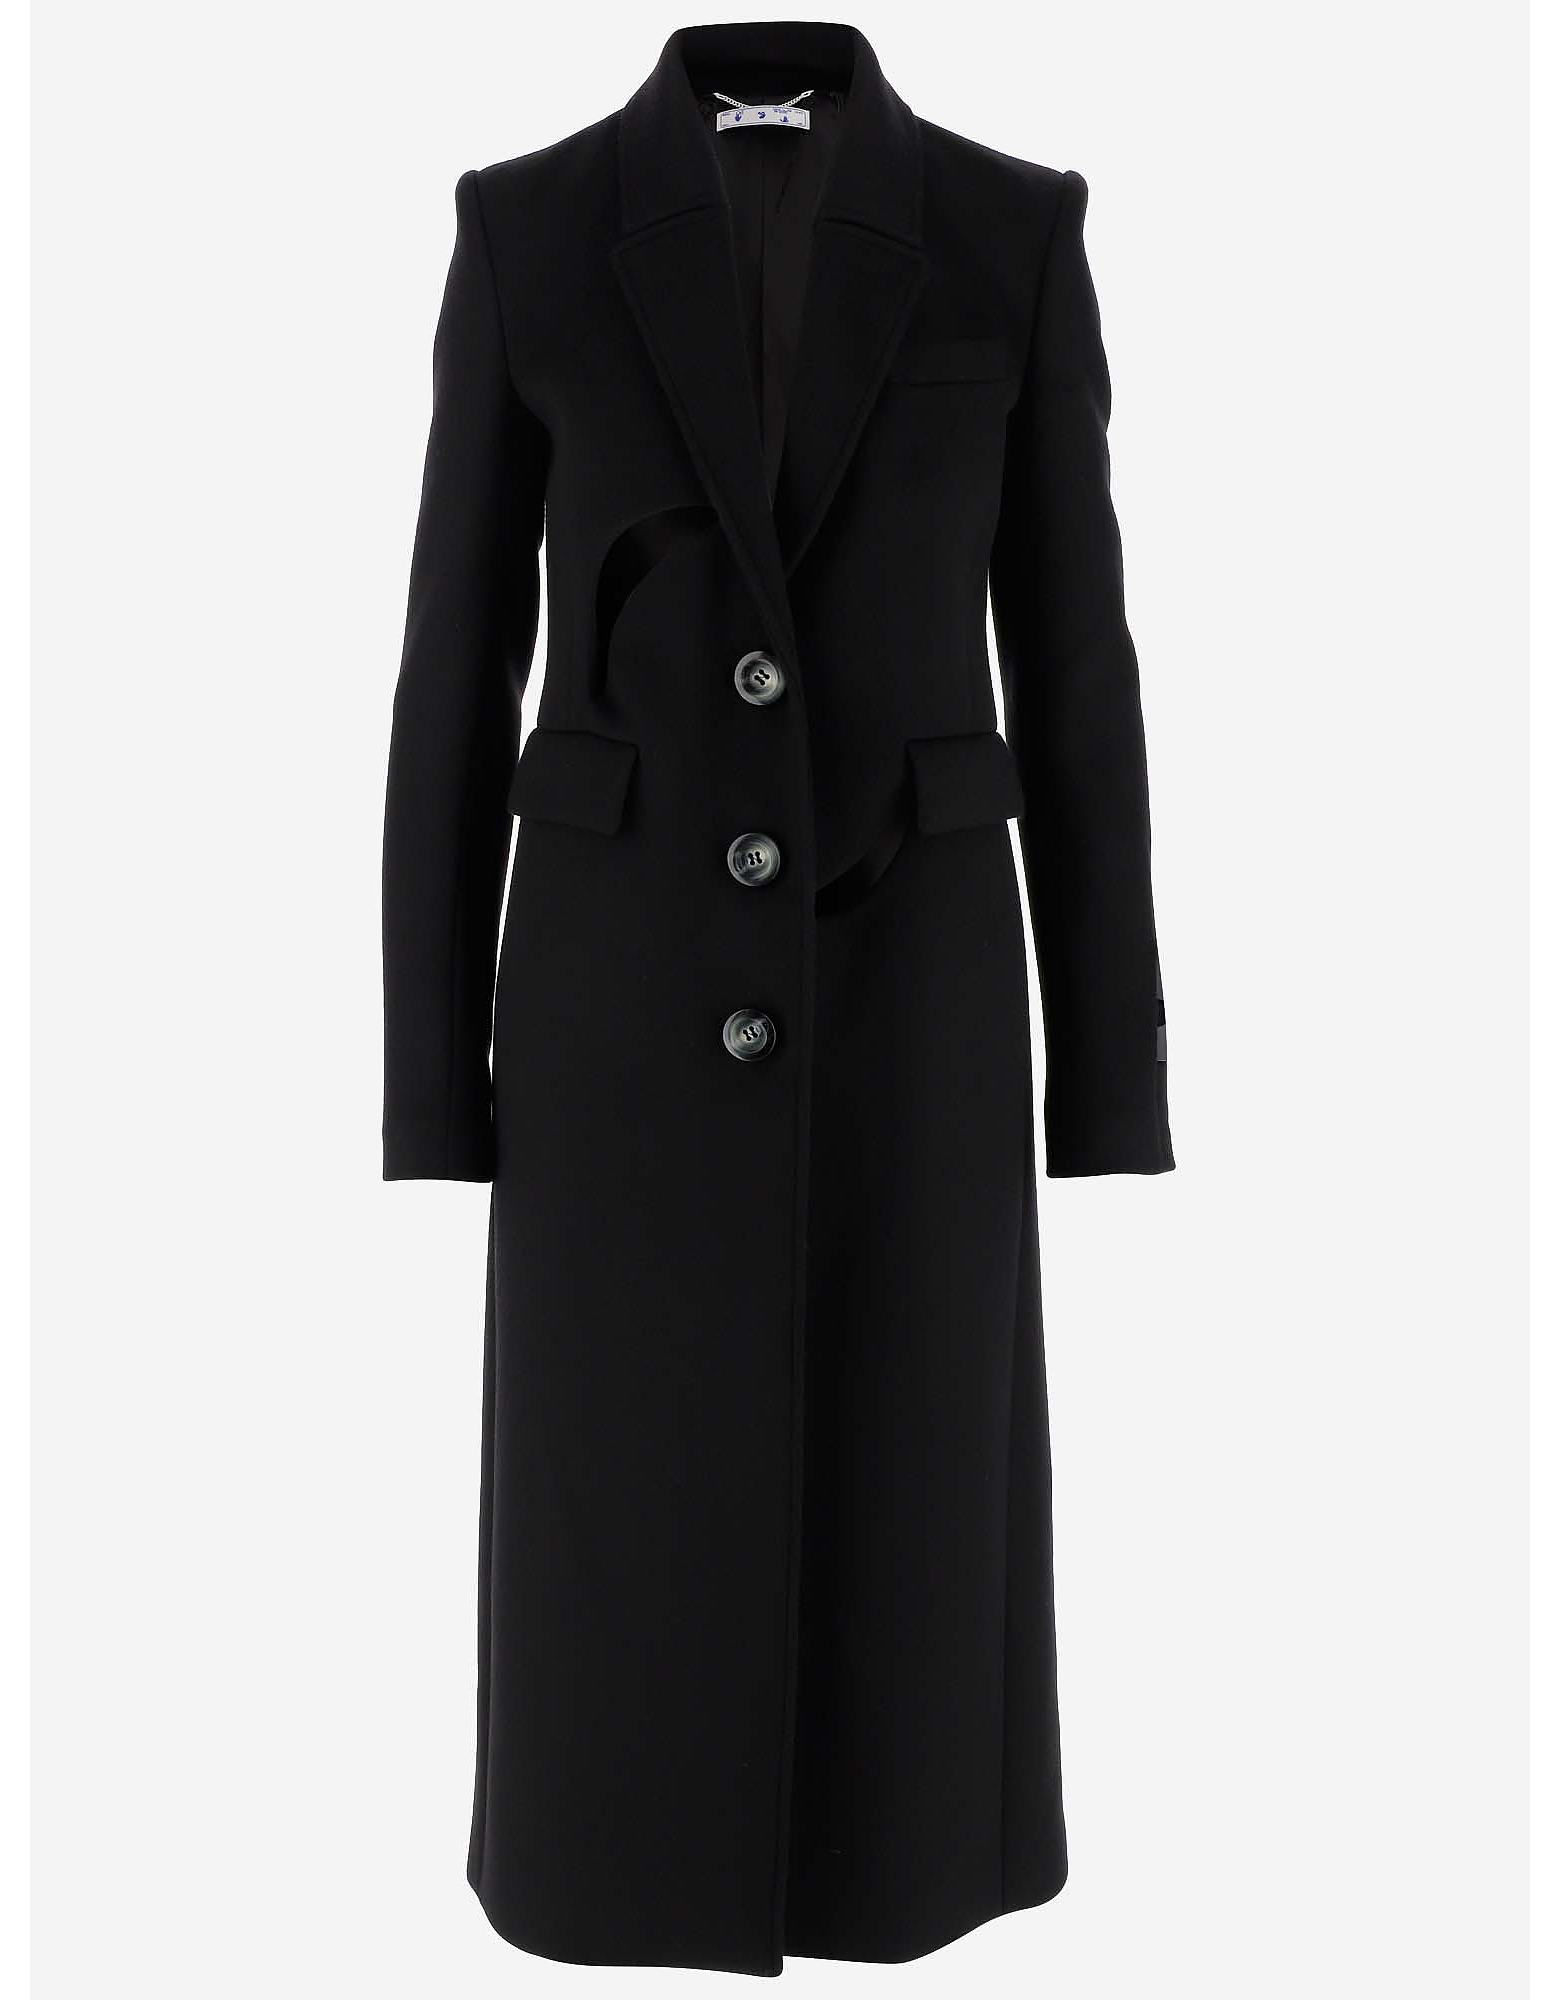 Off-White Designer Coats & Jackets, Black Virgin Wool Women's Coat